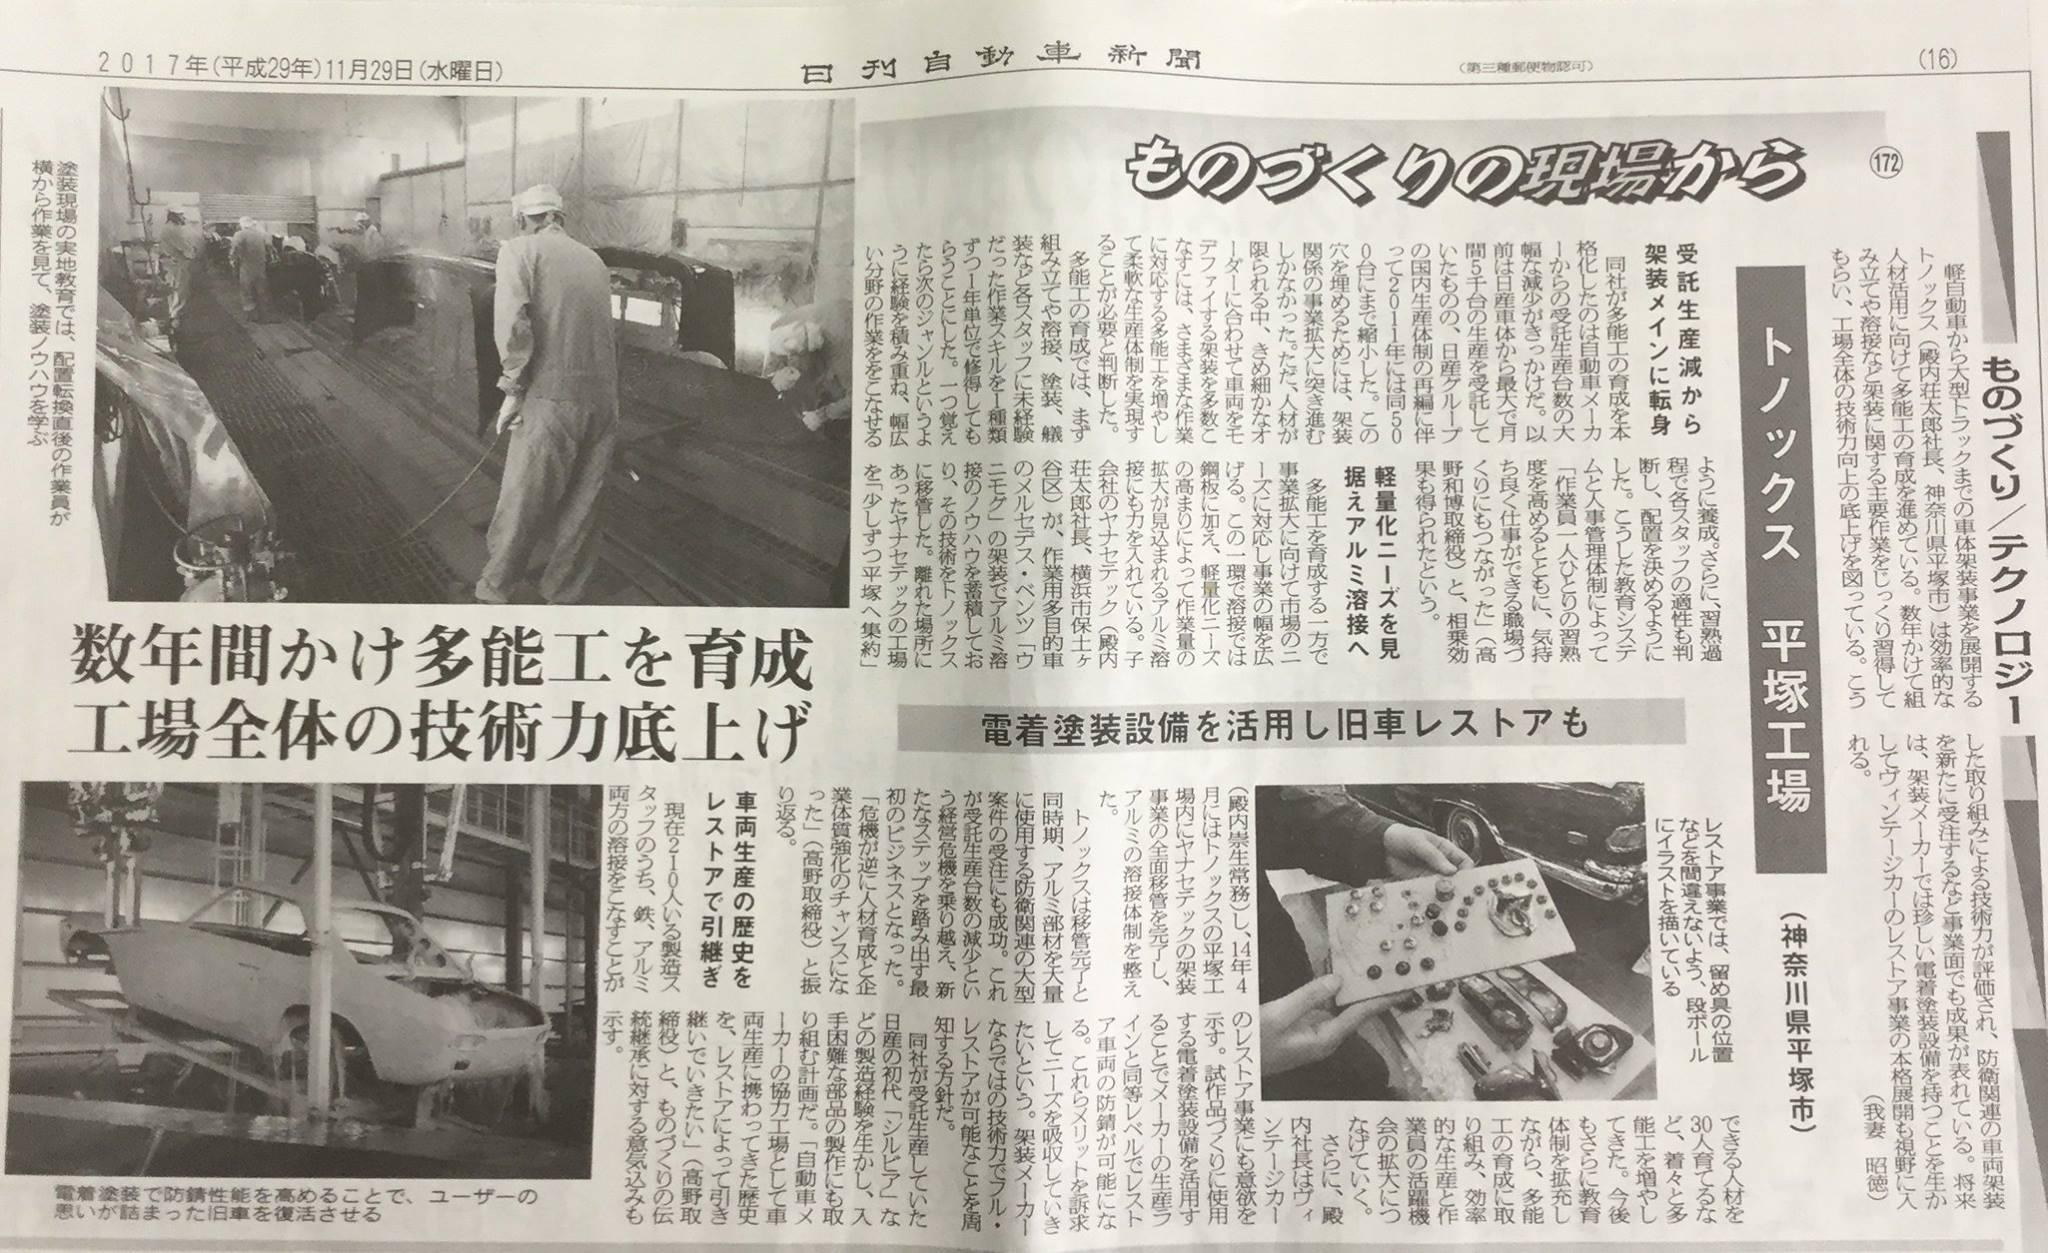 日刊自動車新聞2017年11月29日掲載記事より